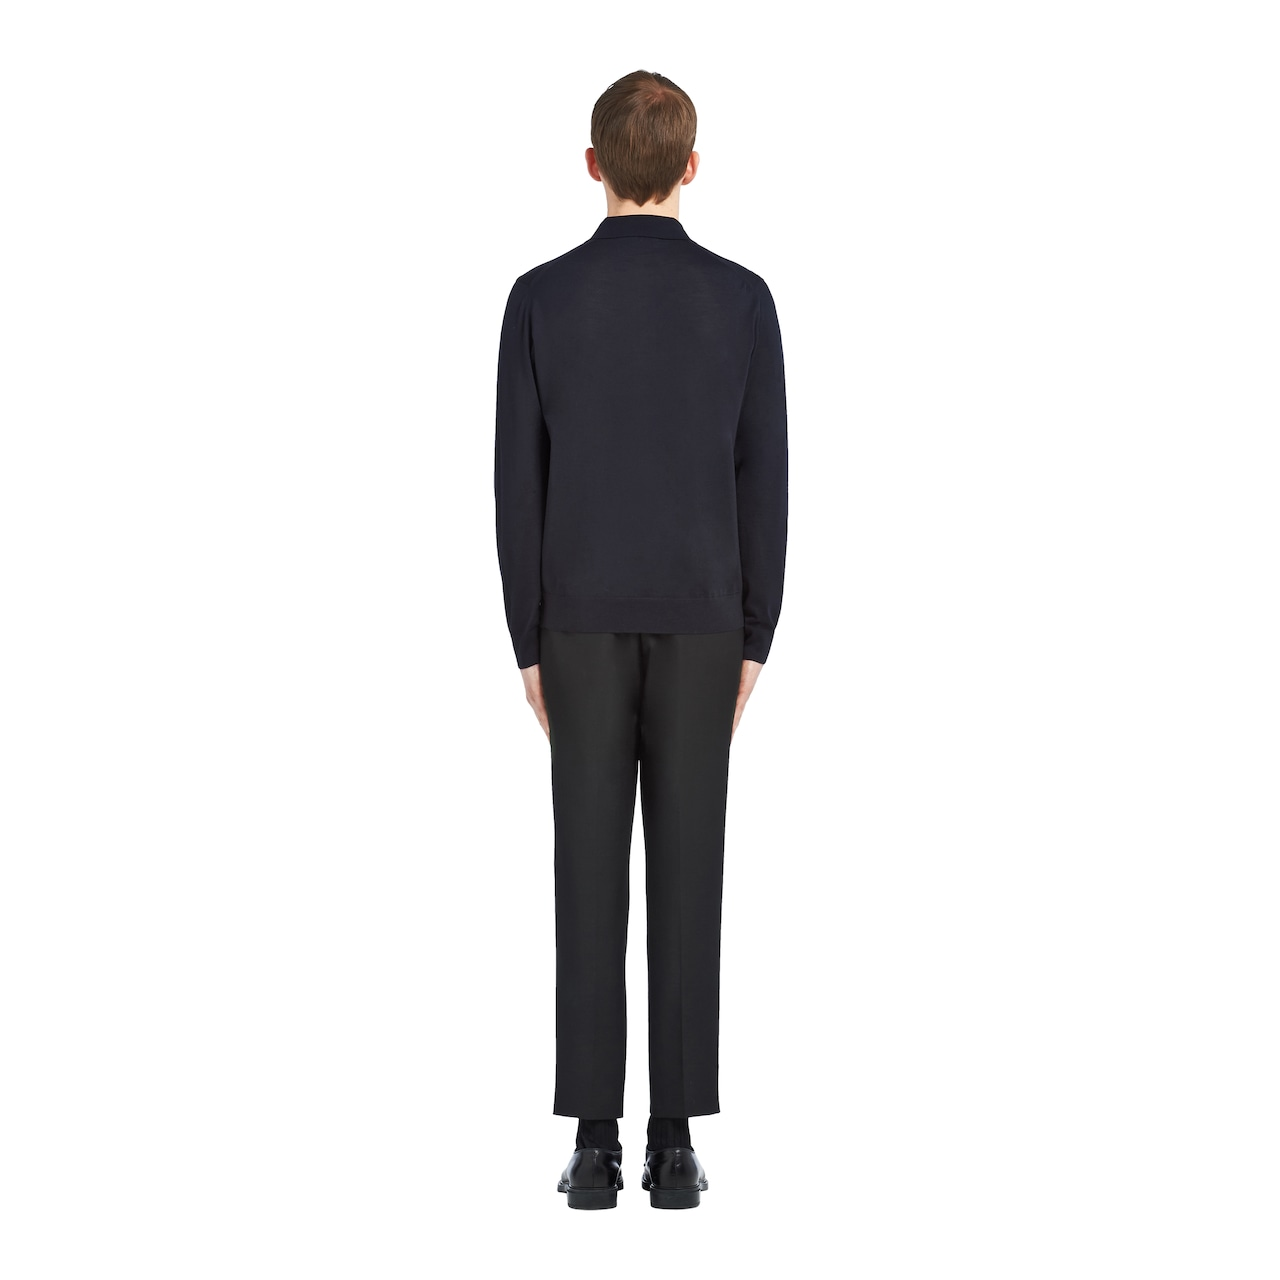 Prada 精纺羊毛Polo衫 4